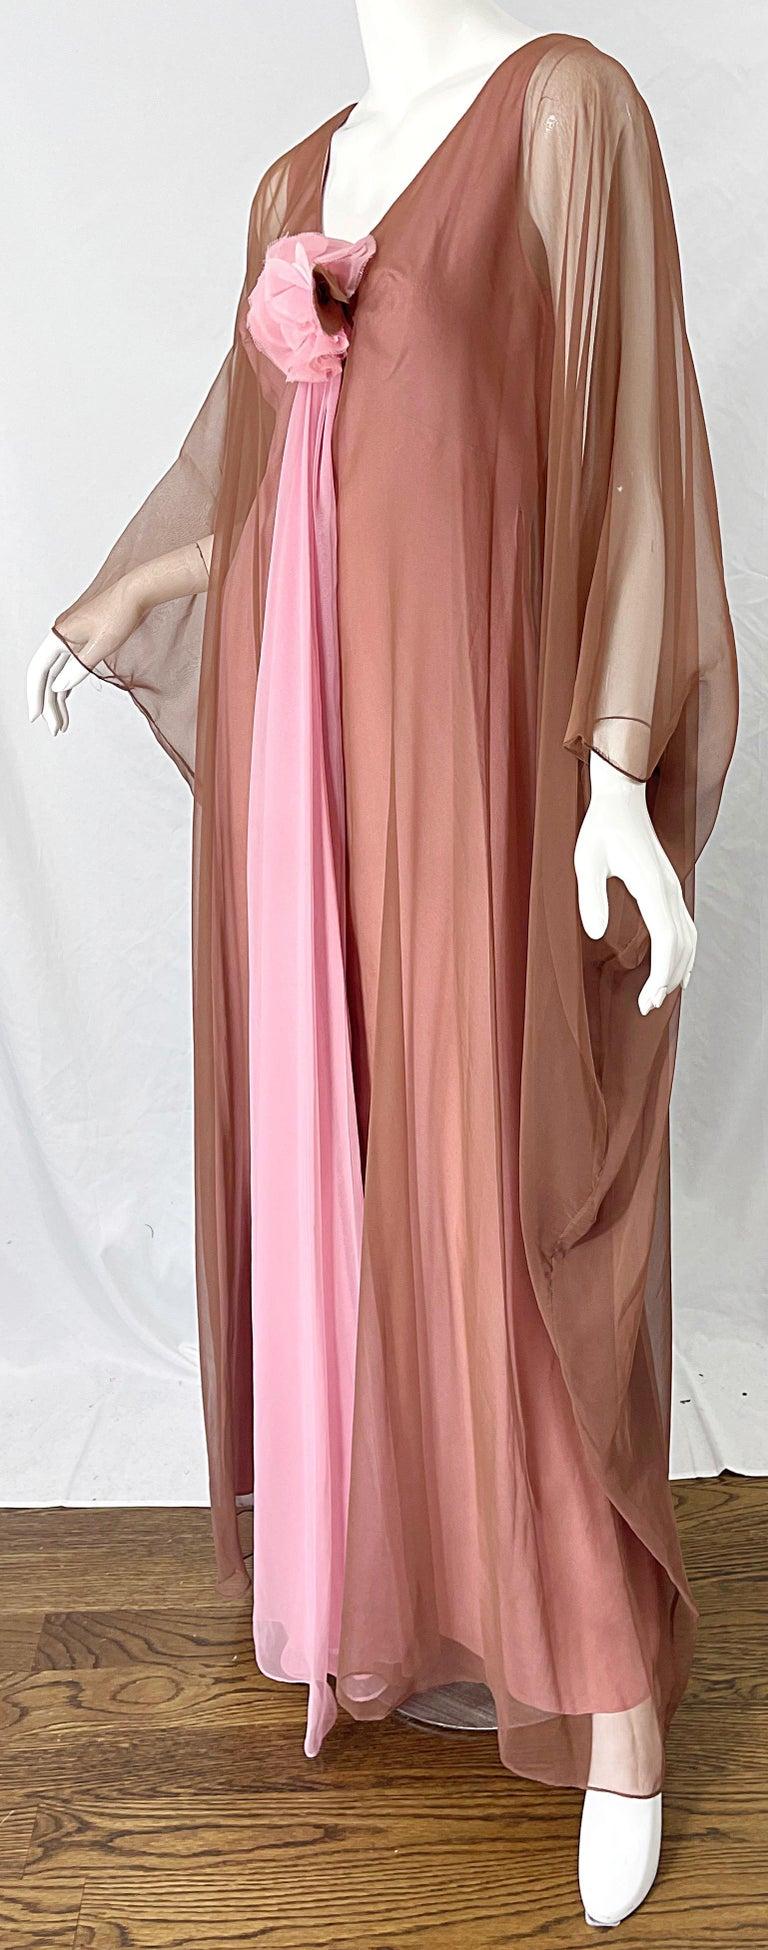 1970s Estevez Pink + Nude Brown Chiffon Caftan Vintage 70s Kaftan Maxi Dress For Sale 3